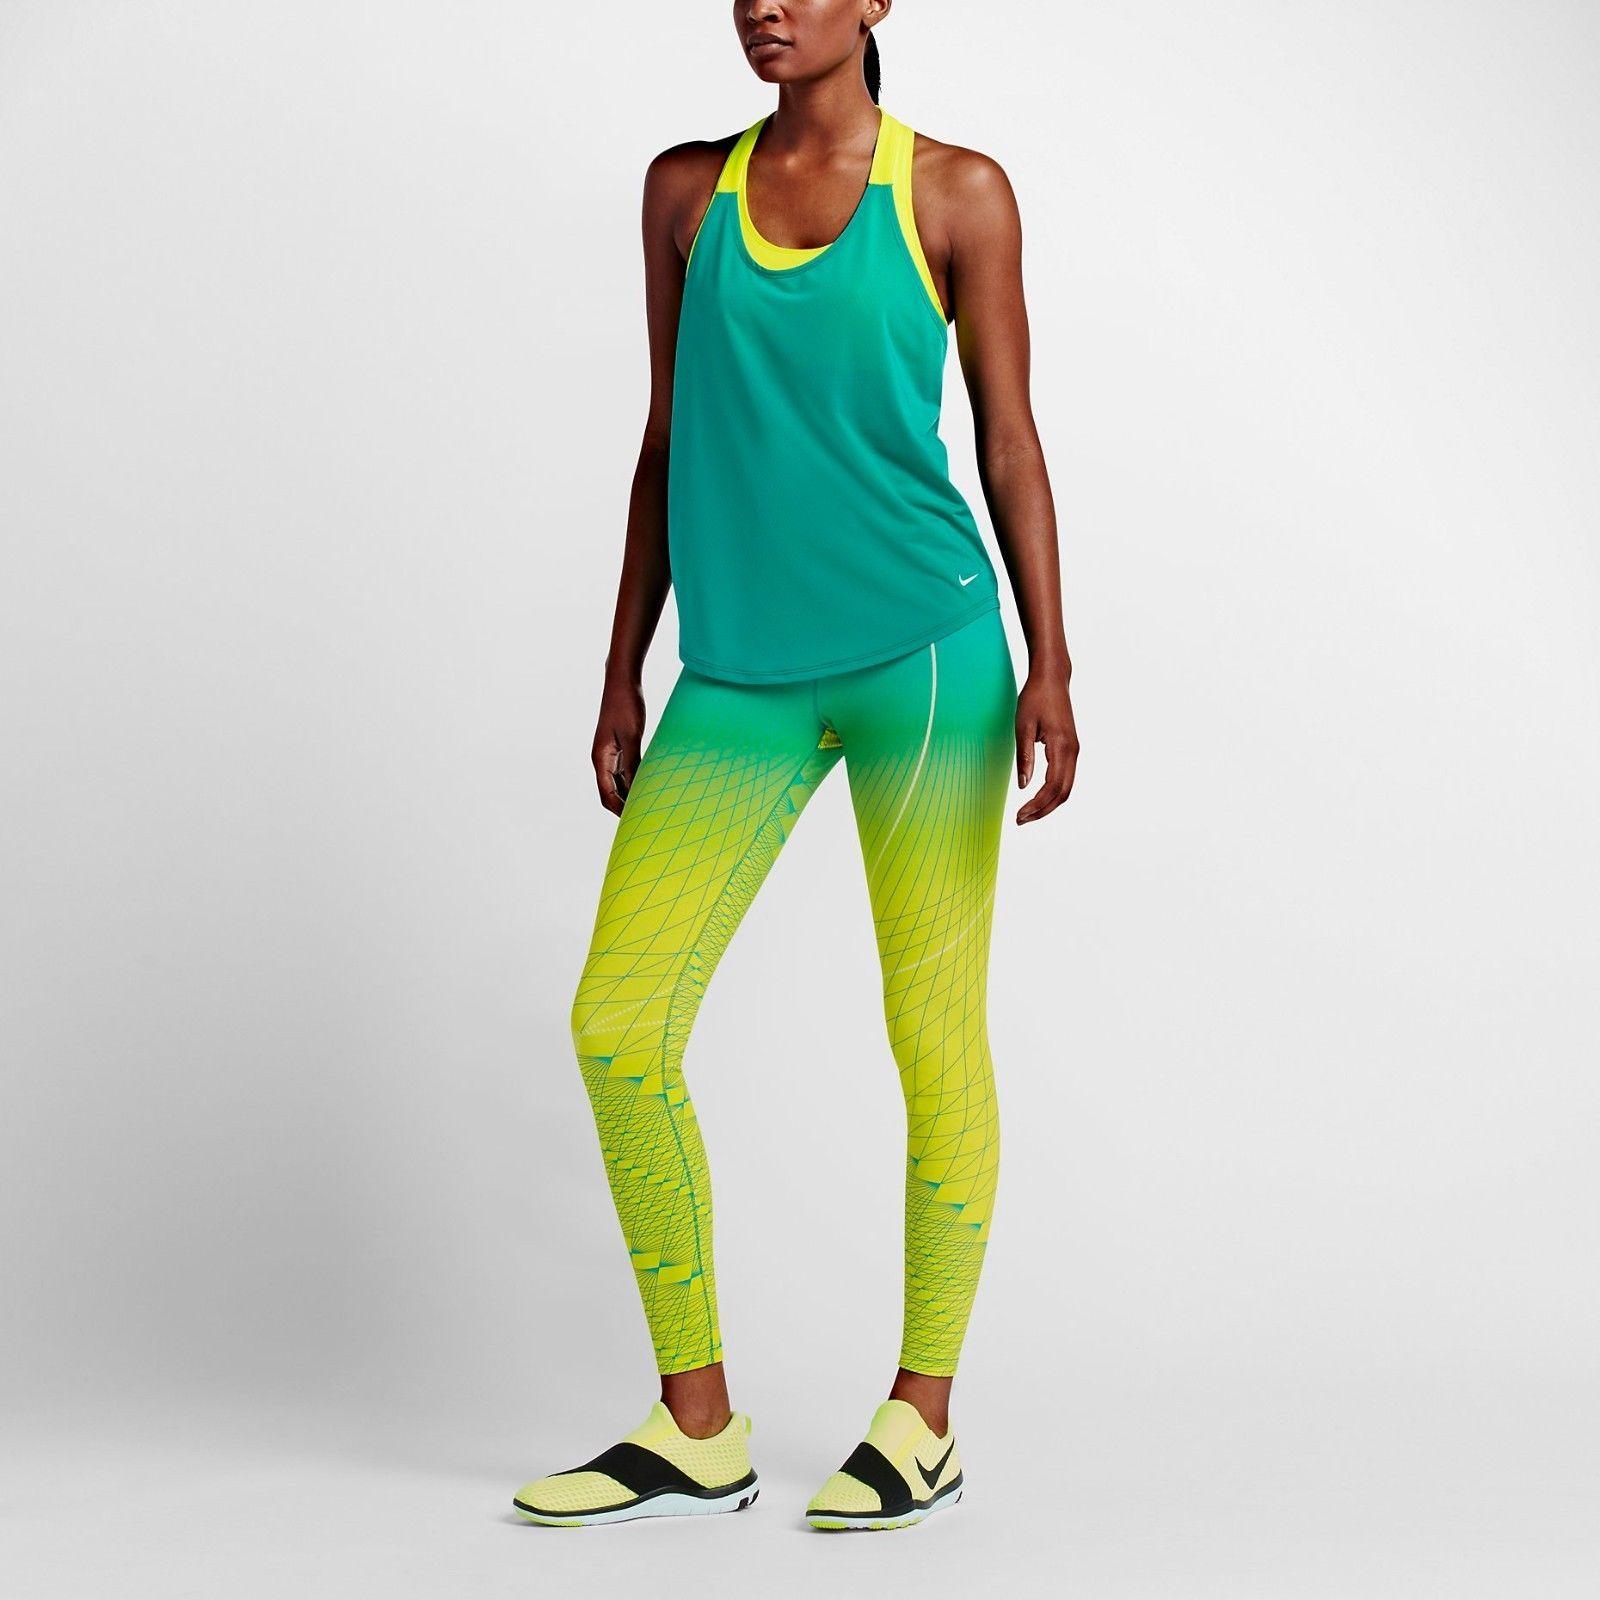 742dccff7c44d7 Nike Power Legendary Printed Mid Rise Training Tights 814287-702 Womens  Medium